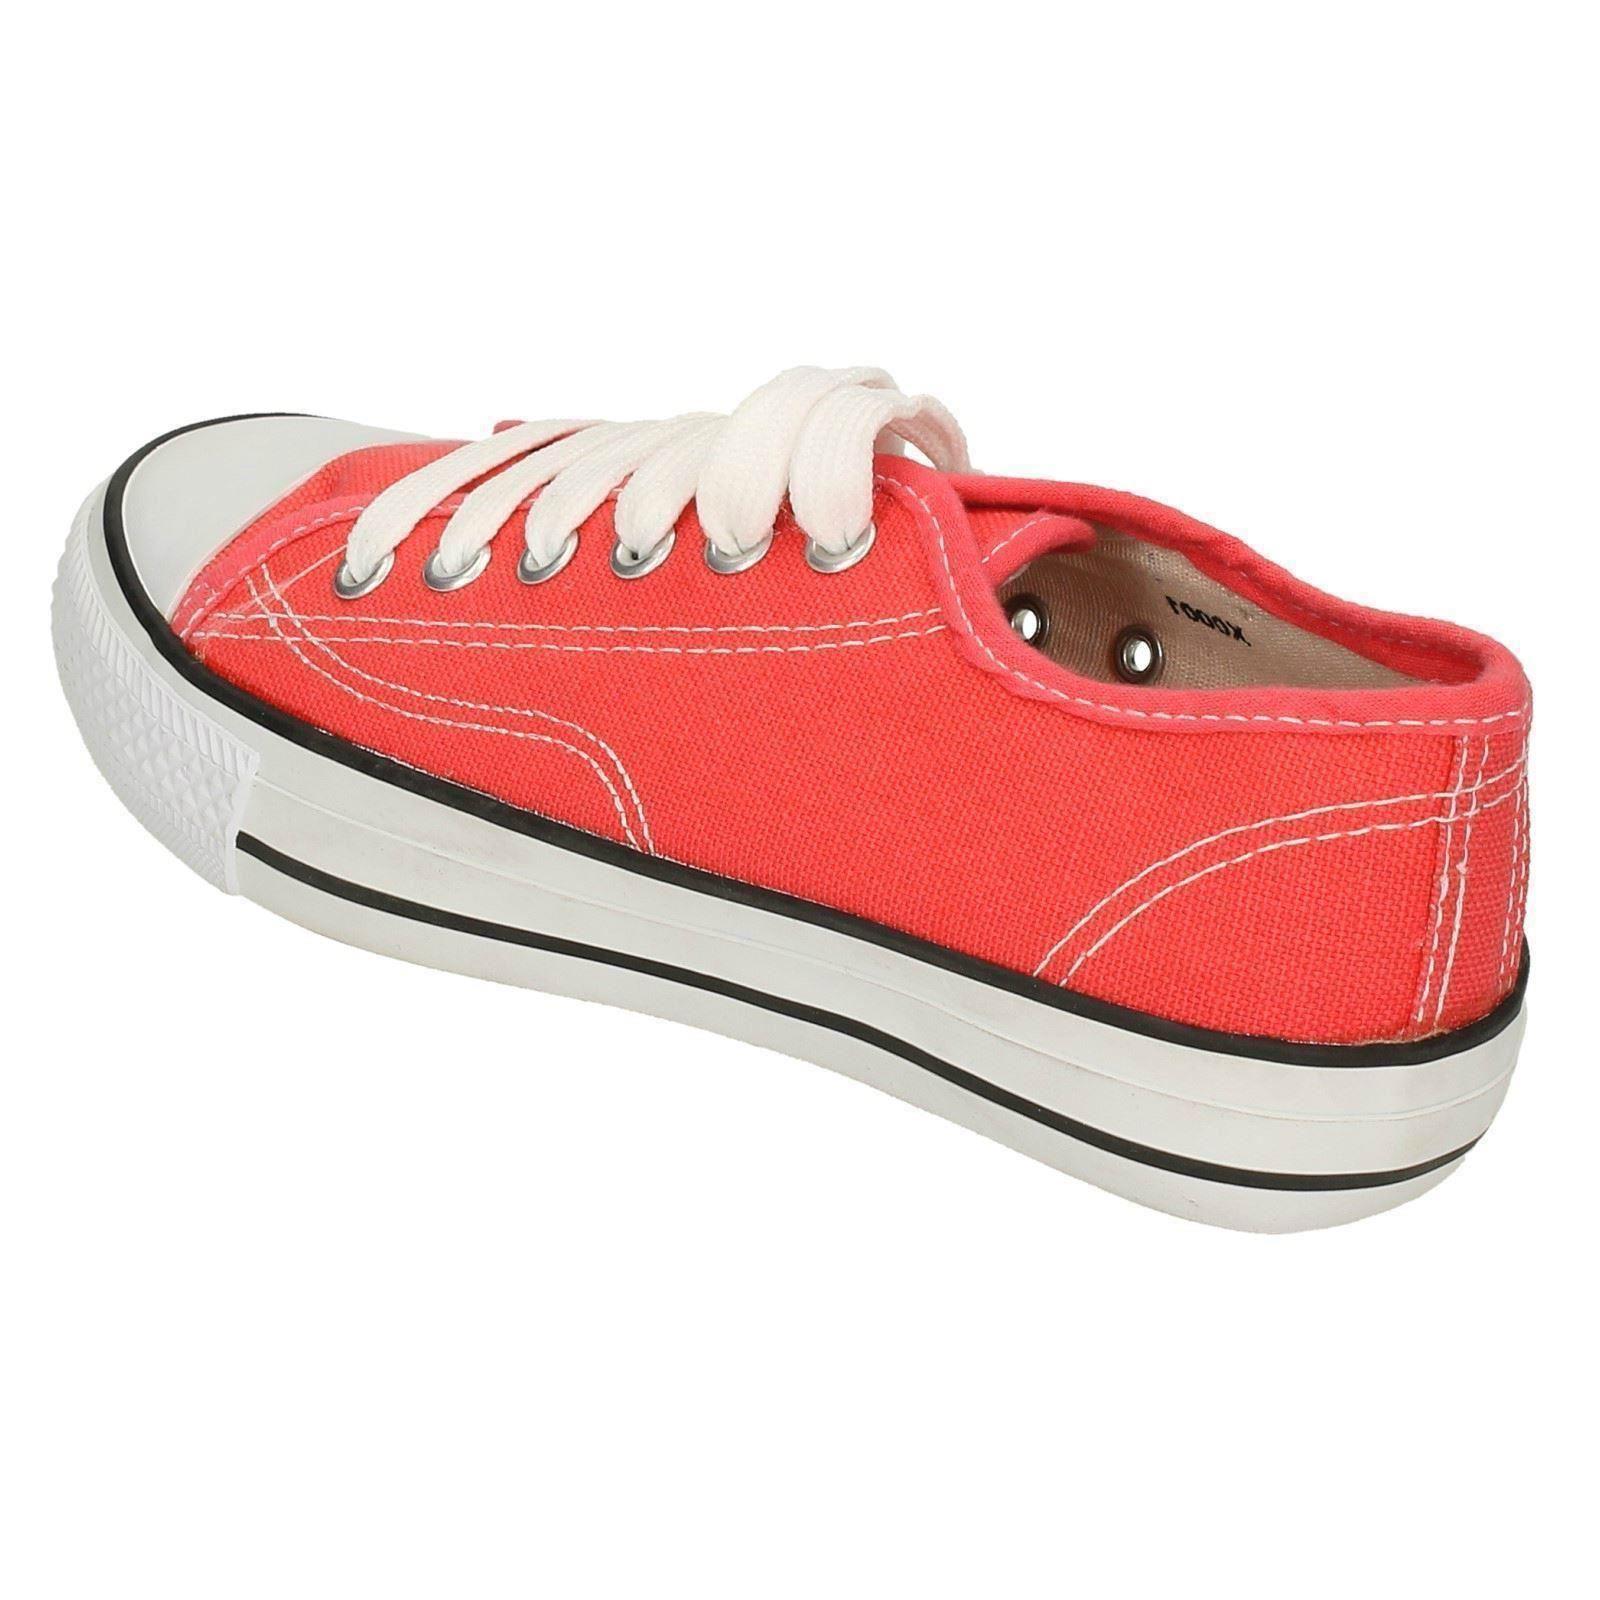 Para Niños Spot Sobre Tela De Encaje Zapatos